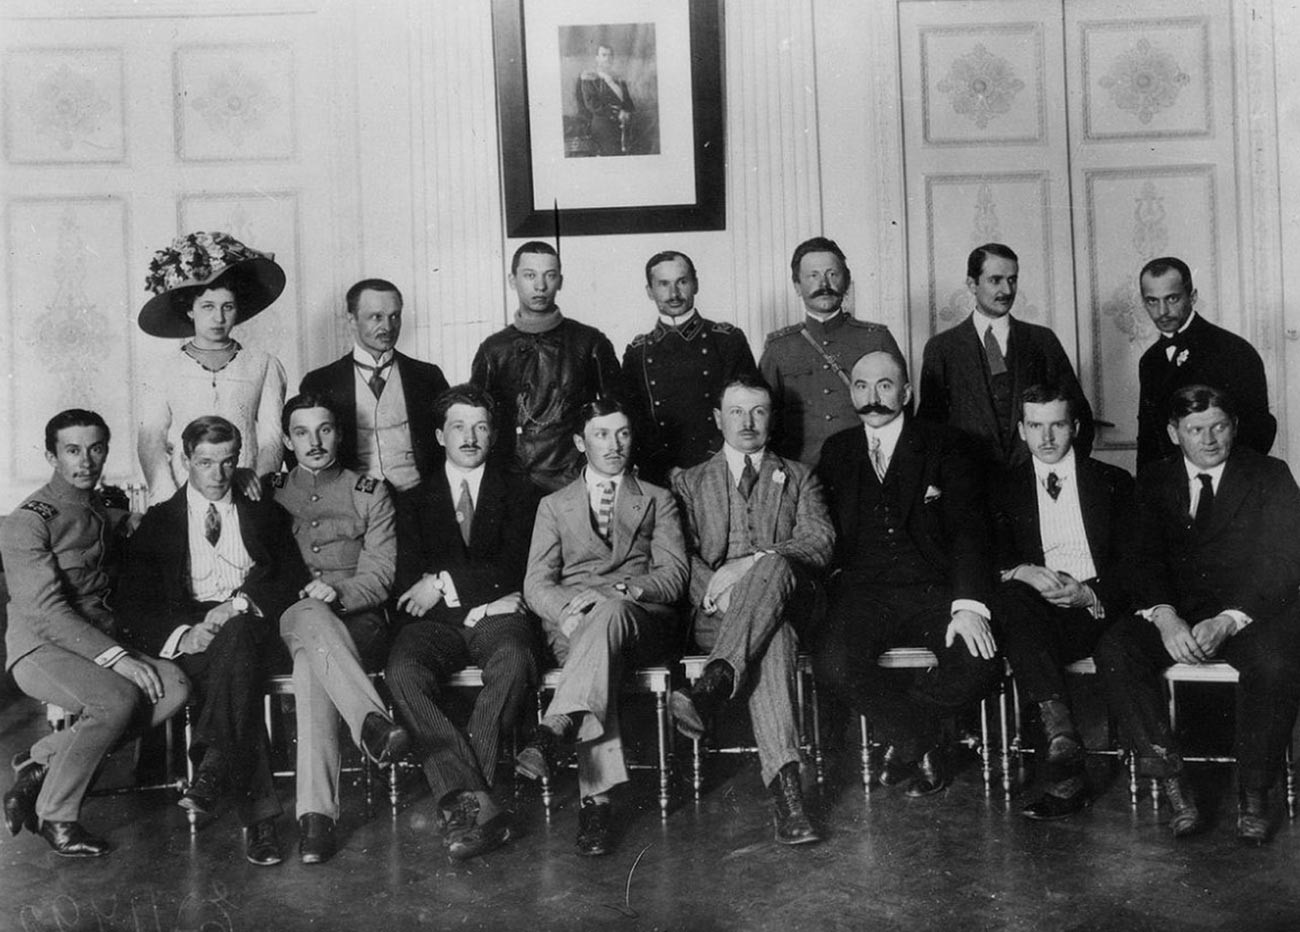 Zvereva bersama para penerbang Rusia.